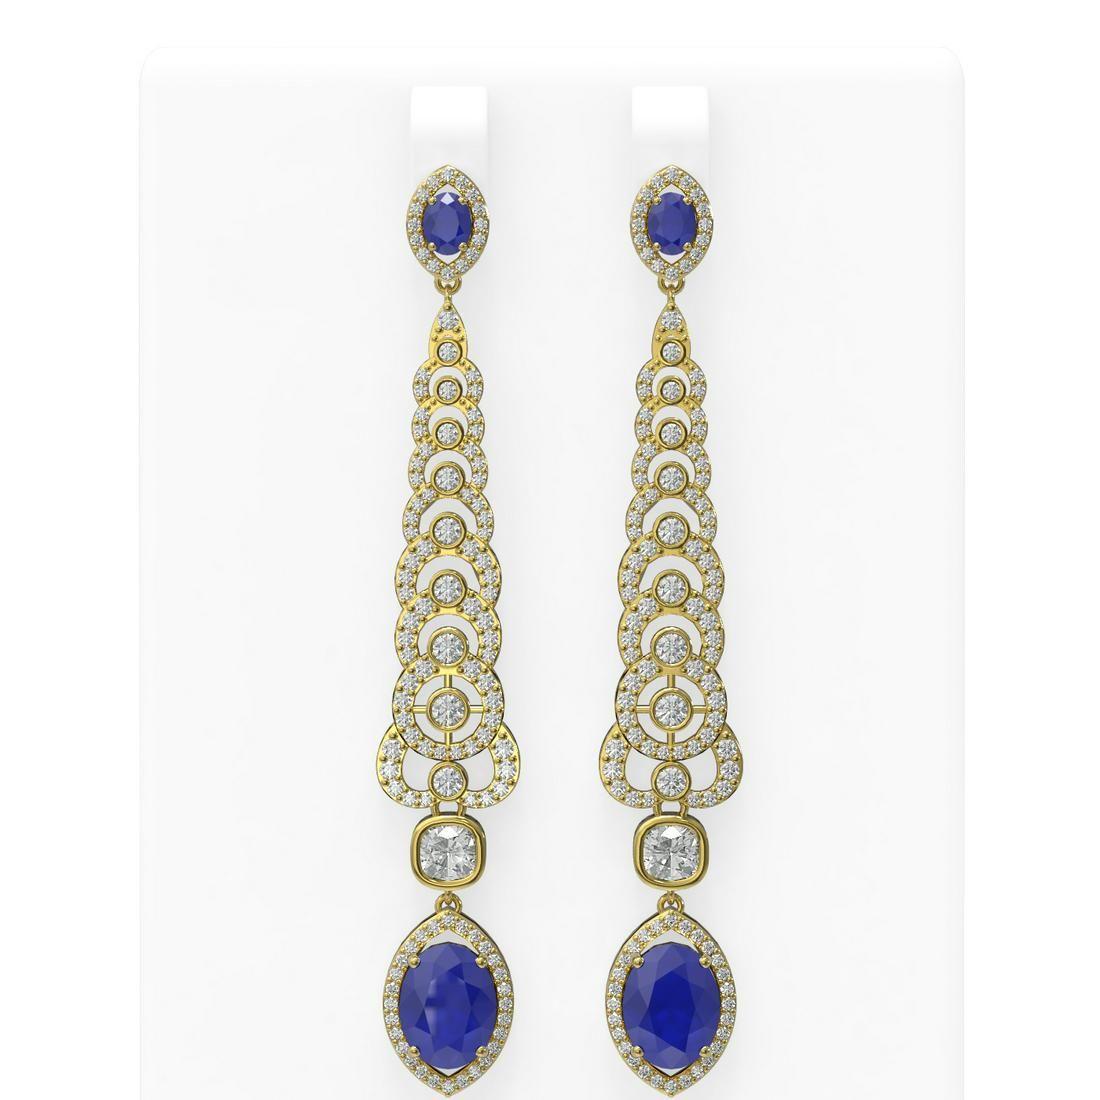 9.18 ctw Sapphire & Diamond Earrings 18K Yellow Gold -